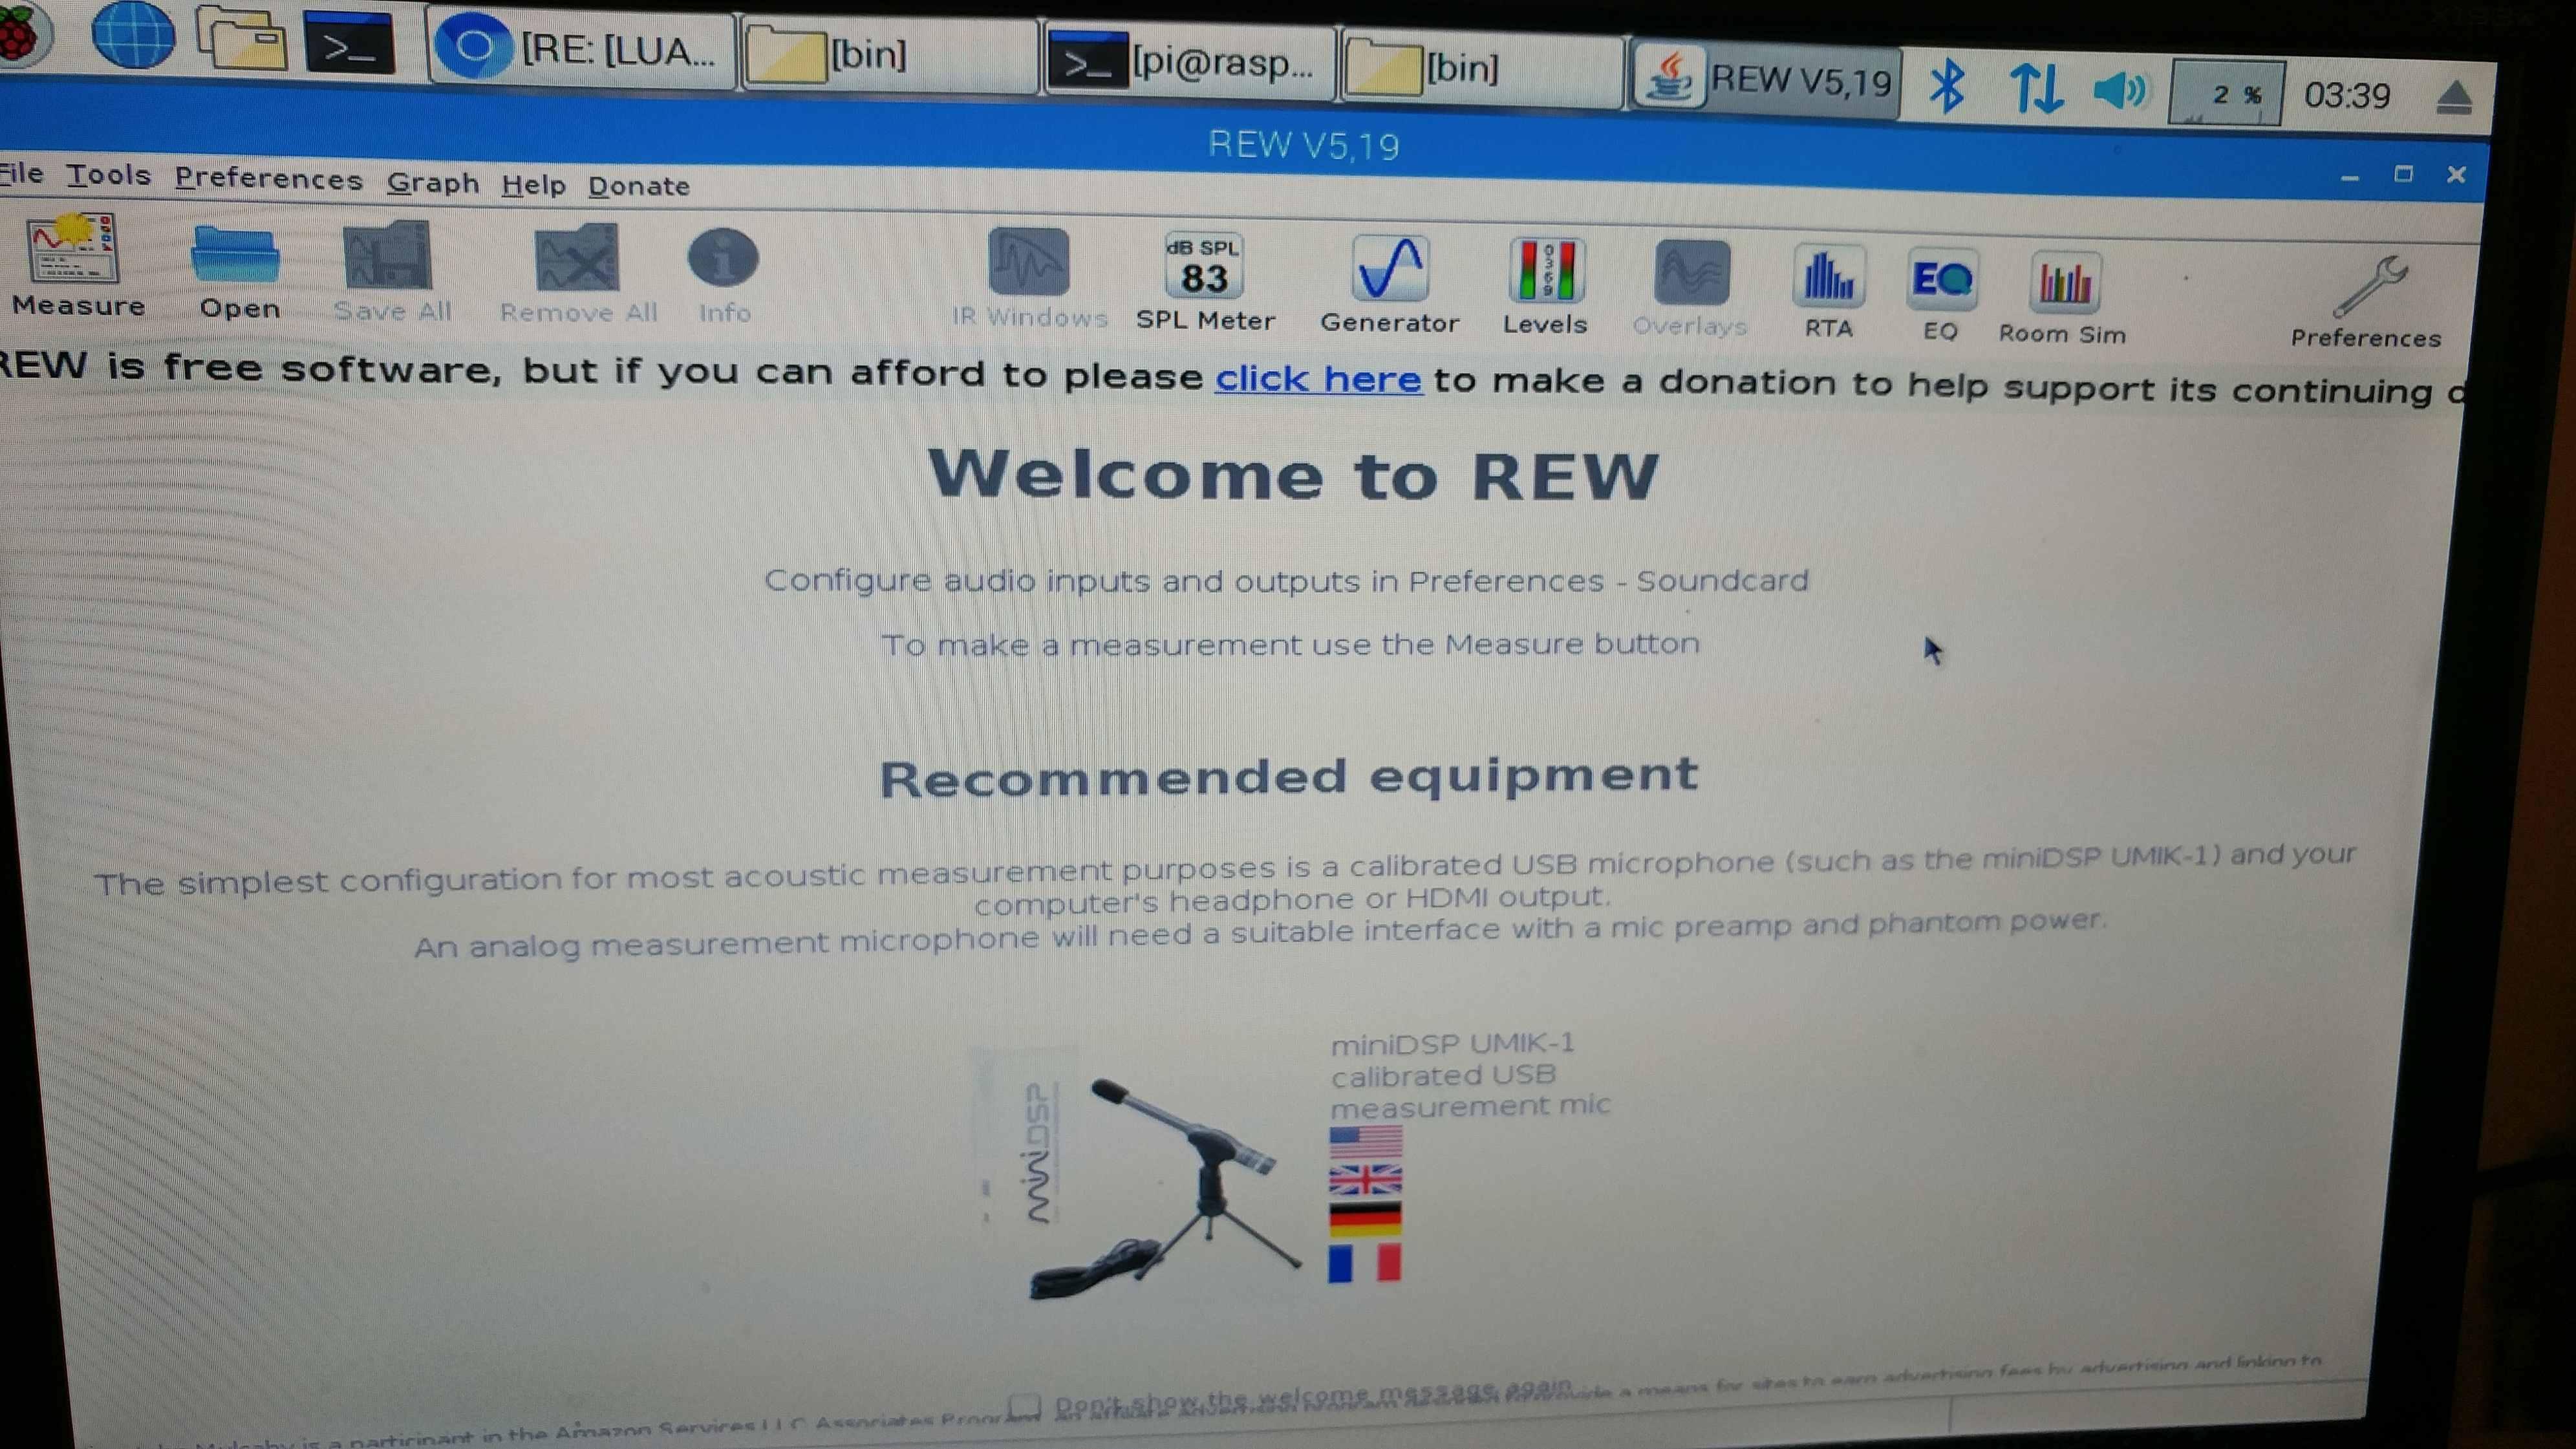 REW sous Raspbian - logiciel mesure 20190409_223923_HDR_zpszpuiwmn0